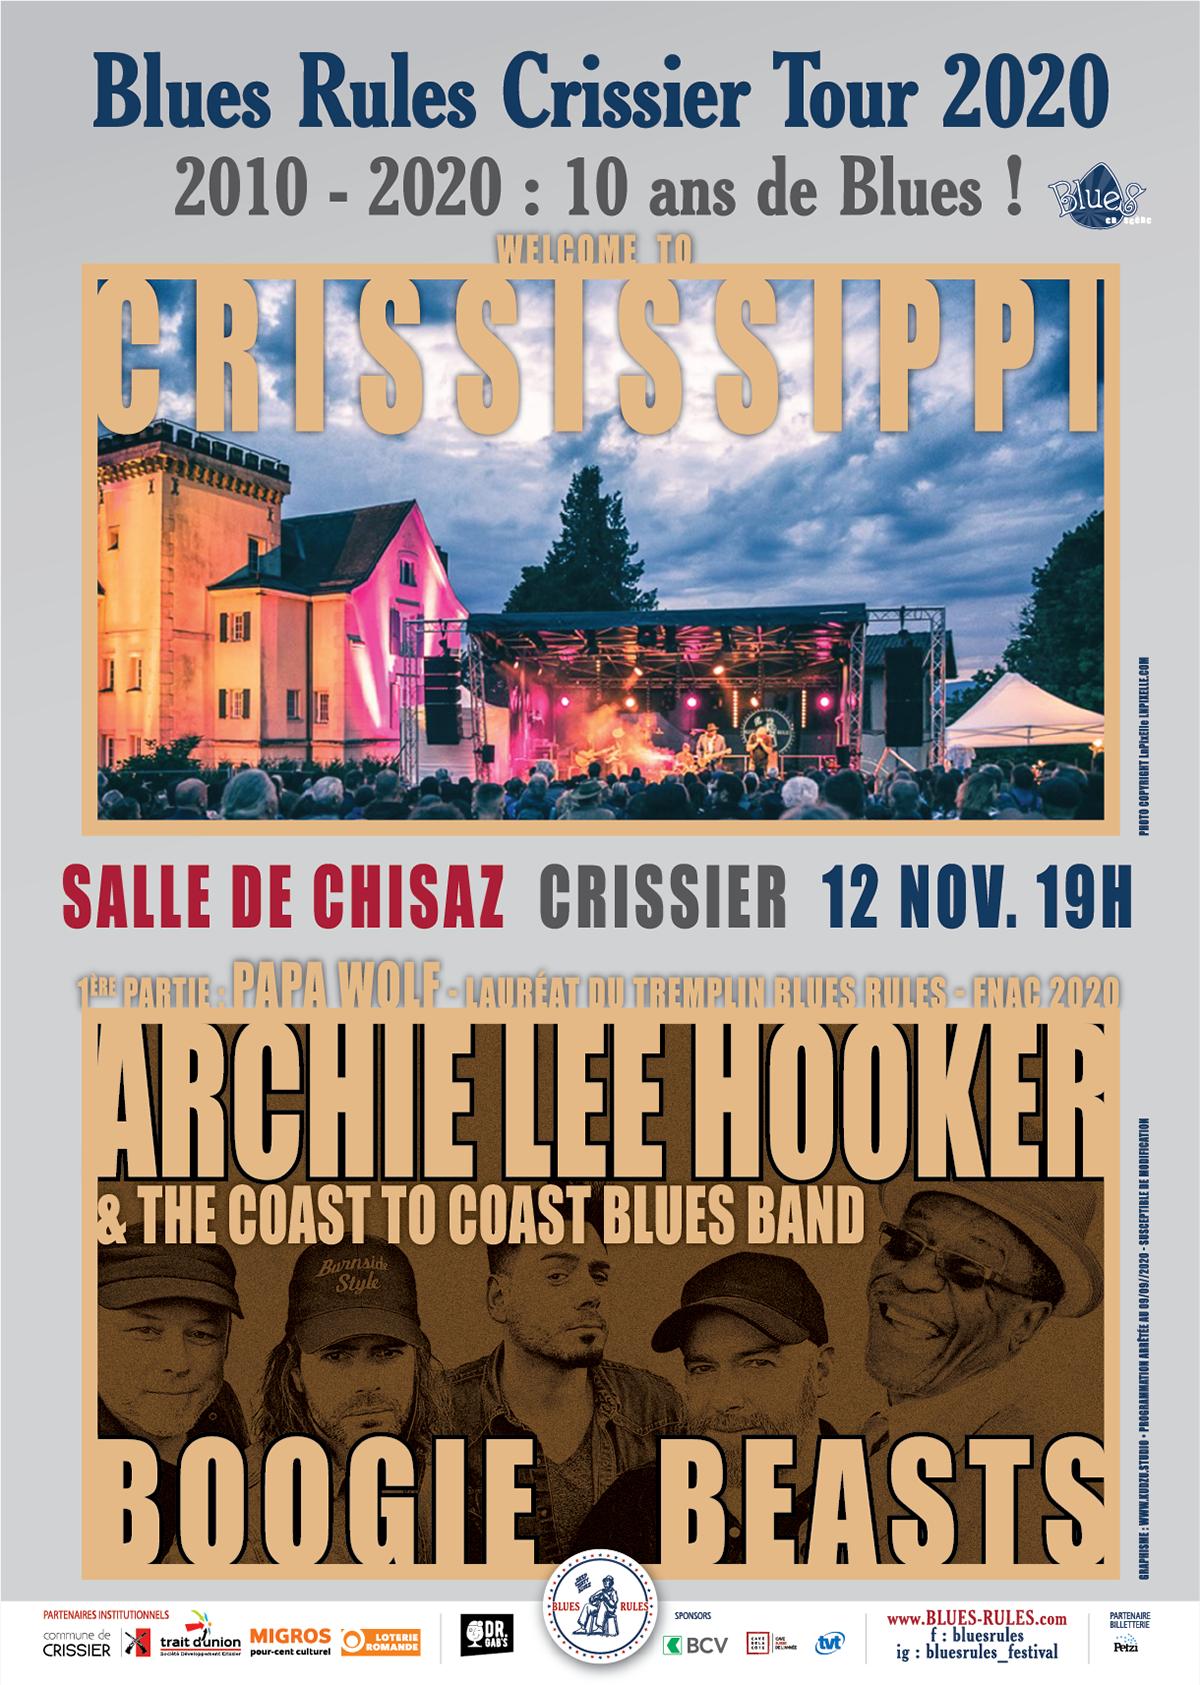 Crississippi tour 2020 crissier